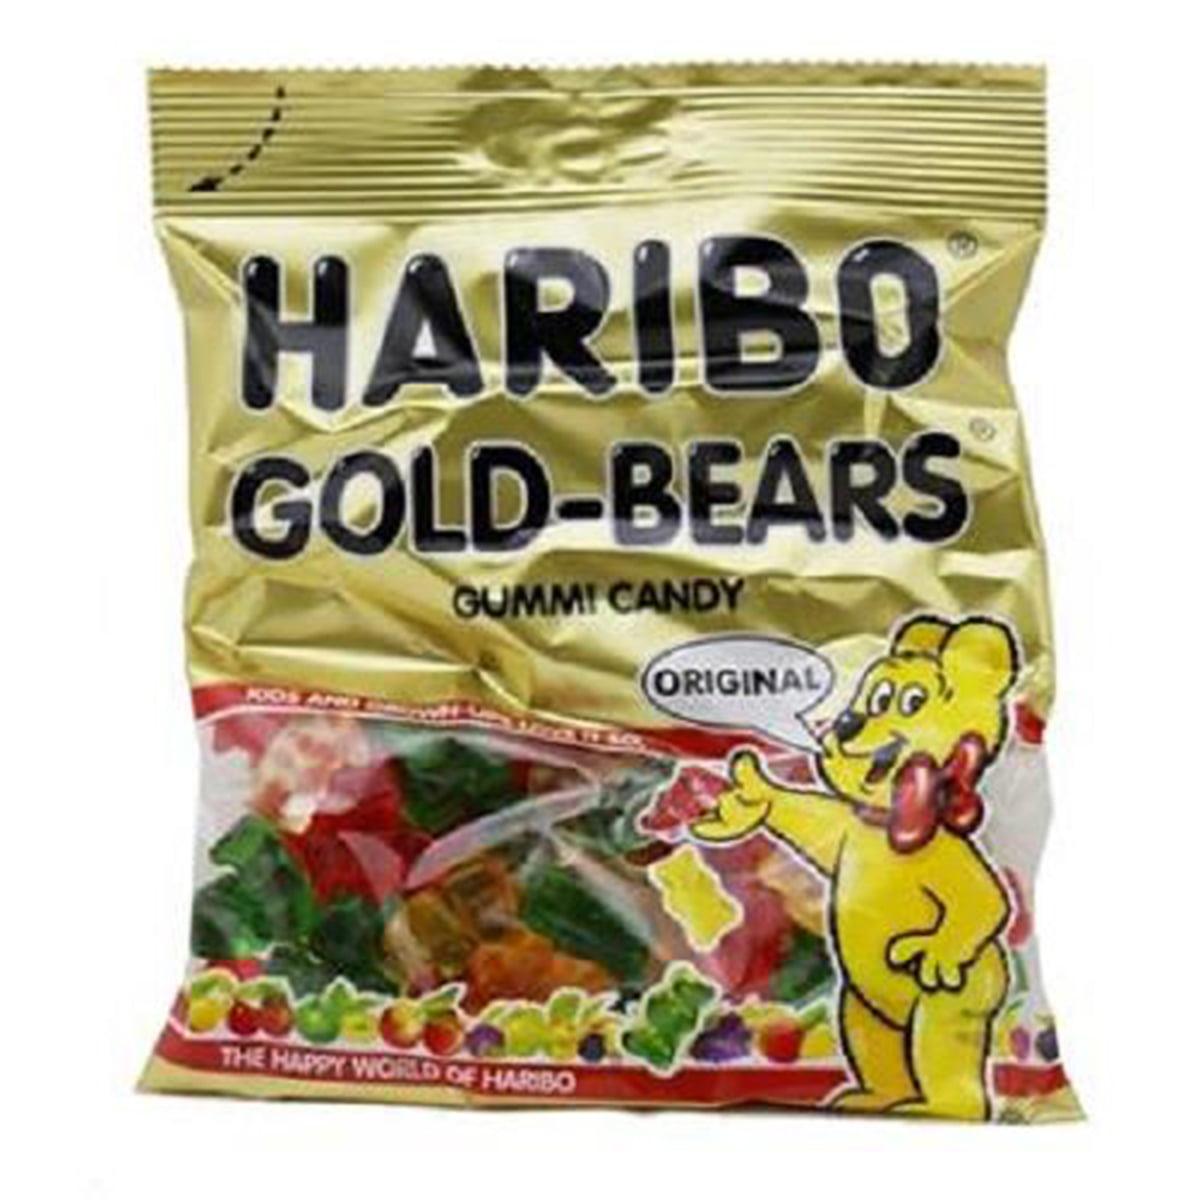 Product Of Haribo, Peg Gold-Bears Gummies, Ct 12 (5 Oz) - Sugar Candy / Grab Varieties & Flavors